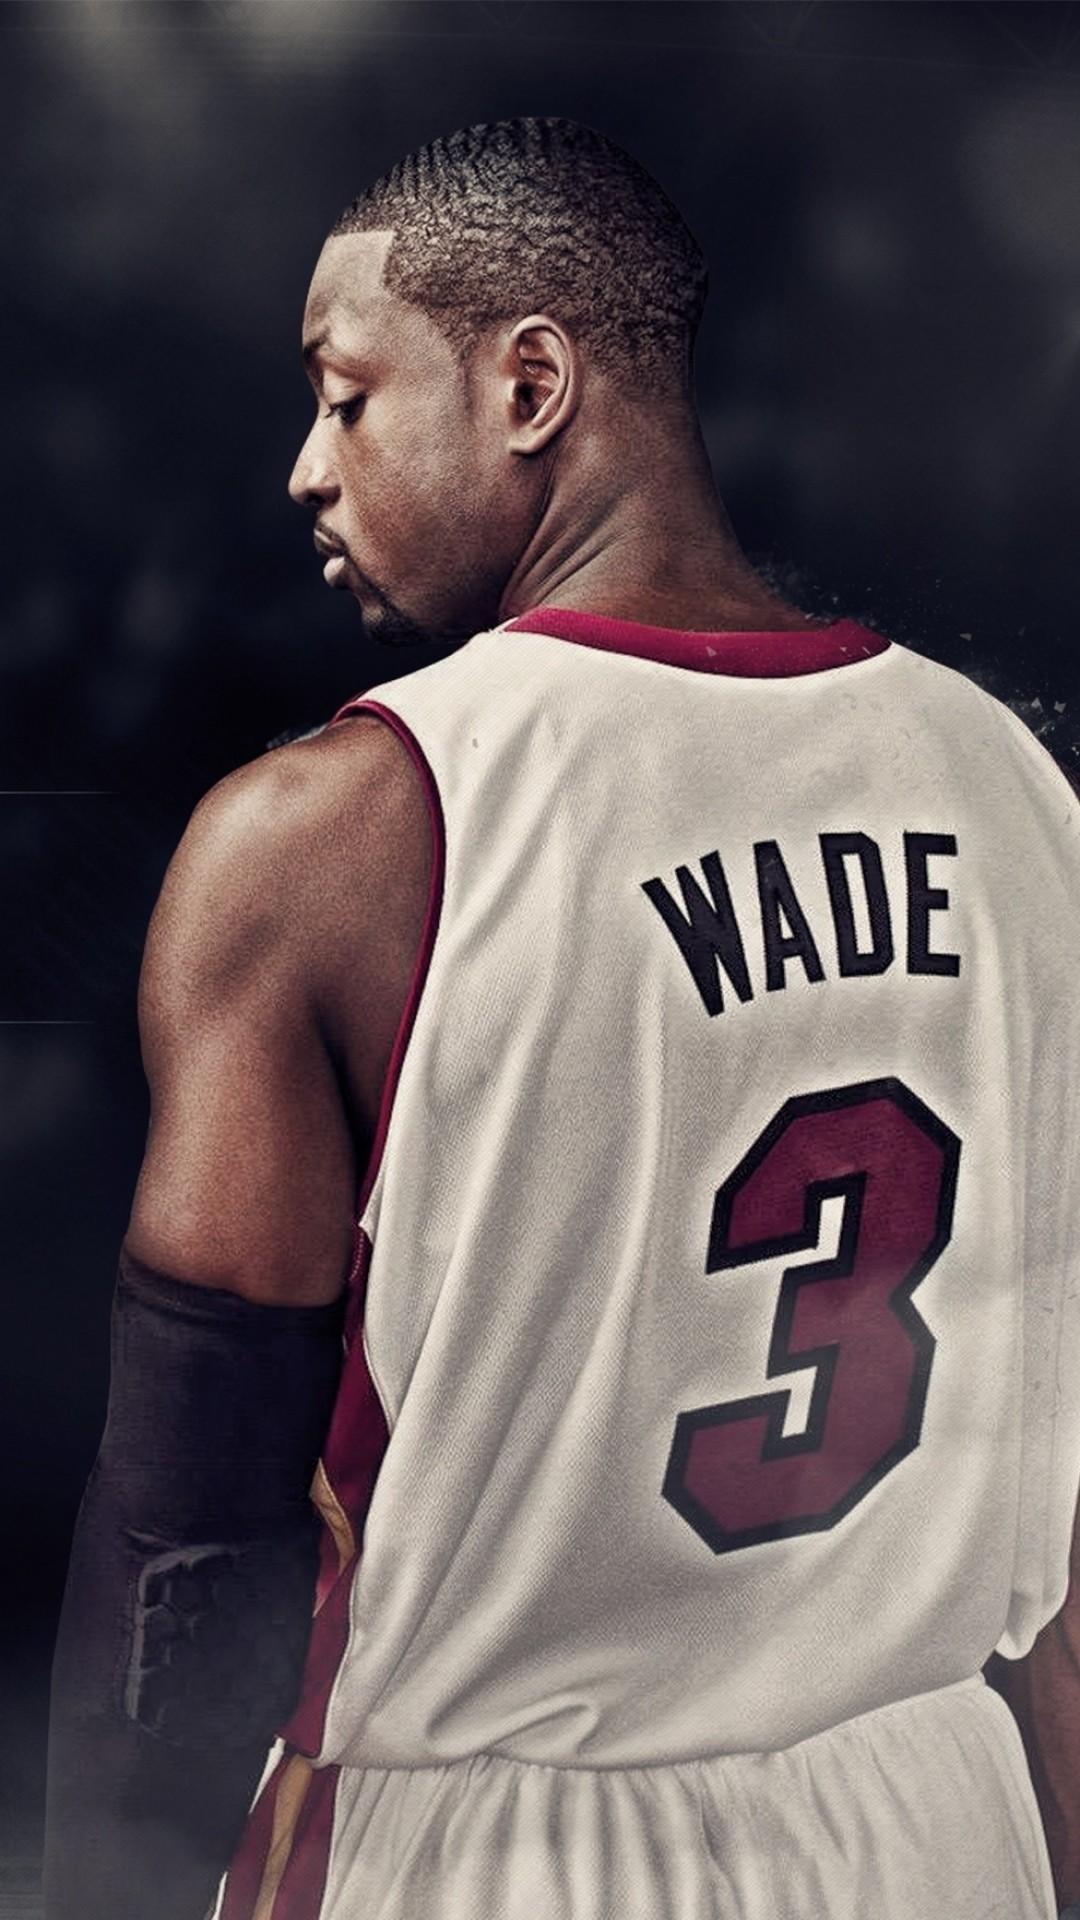 Wallpaper dwyane wade, basketball player, miami heat, 3, nba